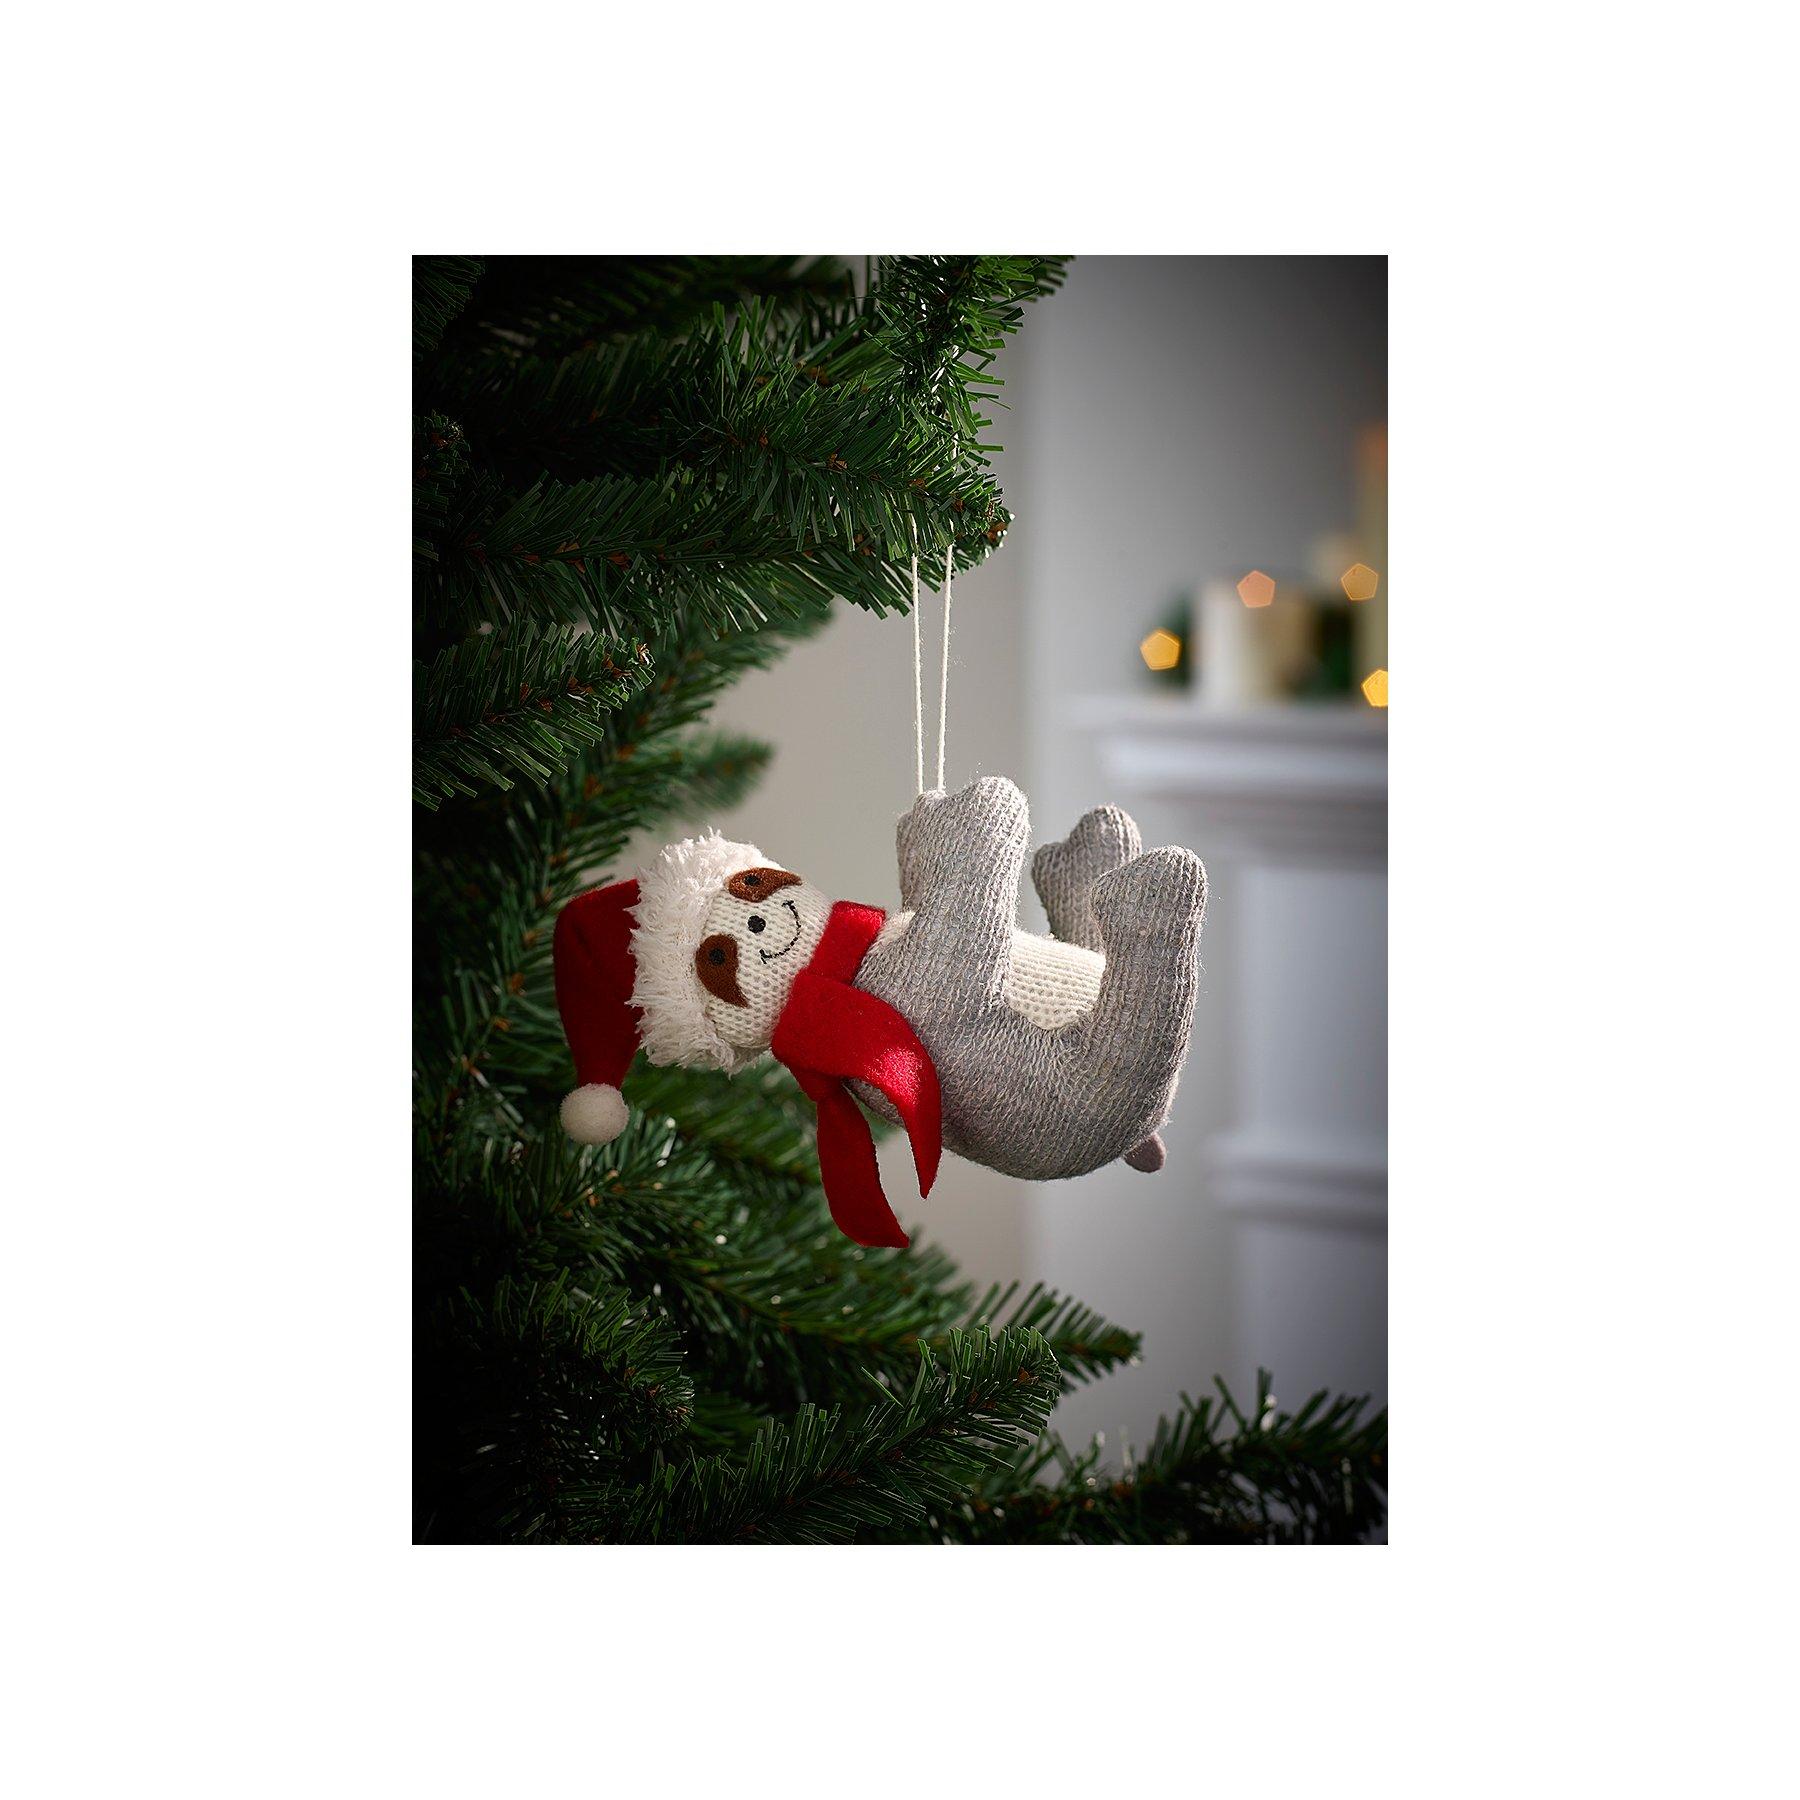 Christmas Sloth.Festive Sloth Christmas Tree Bauble